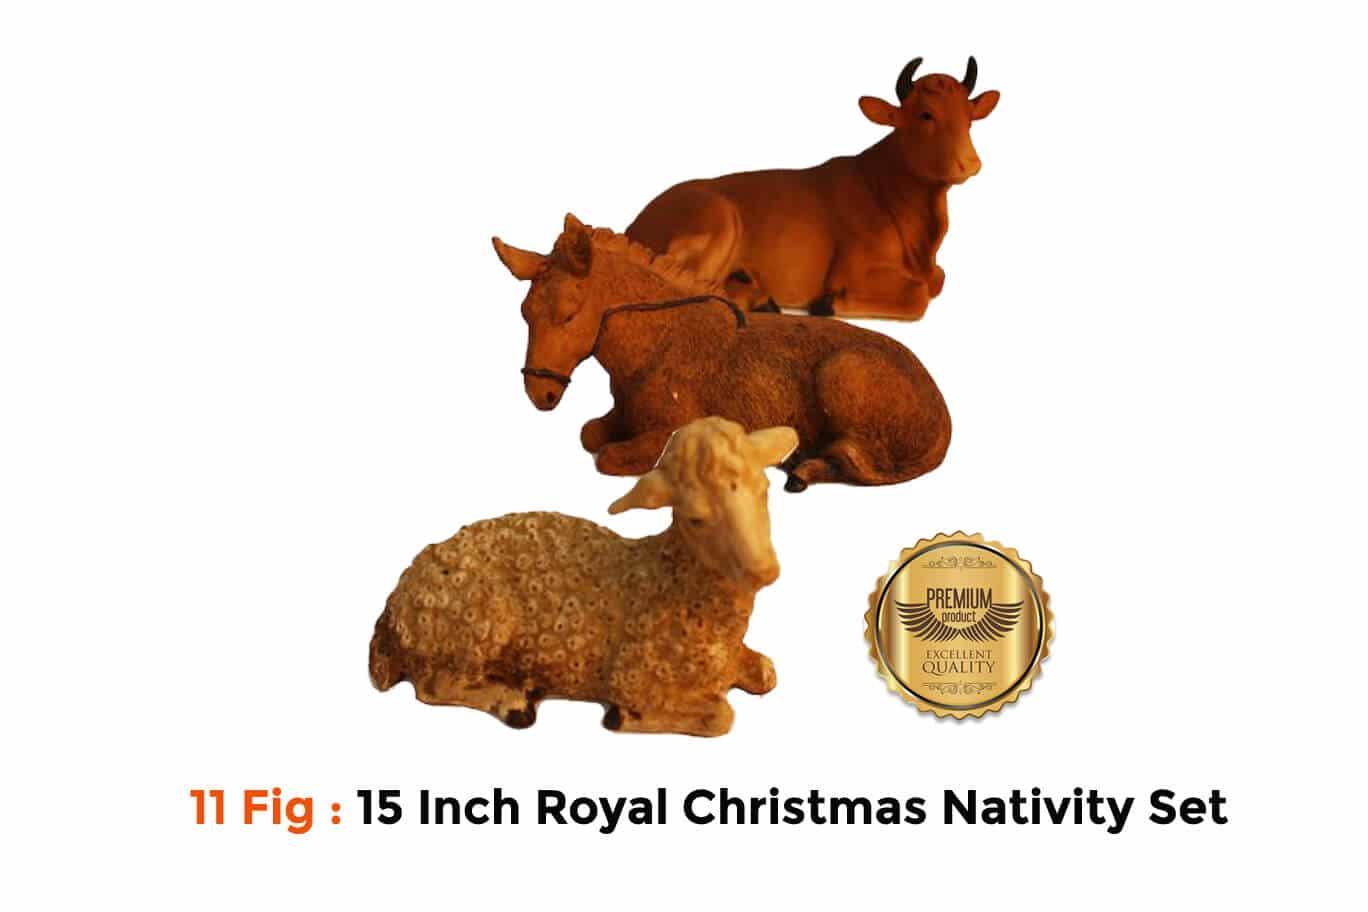 Jesuskart 15Inch Royal Nativity Cattle Set-buy online